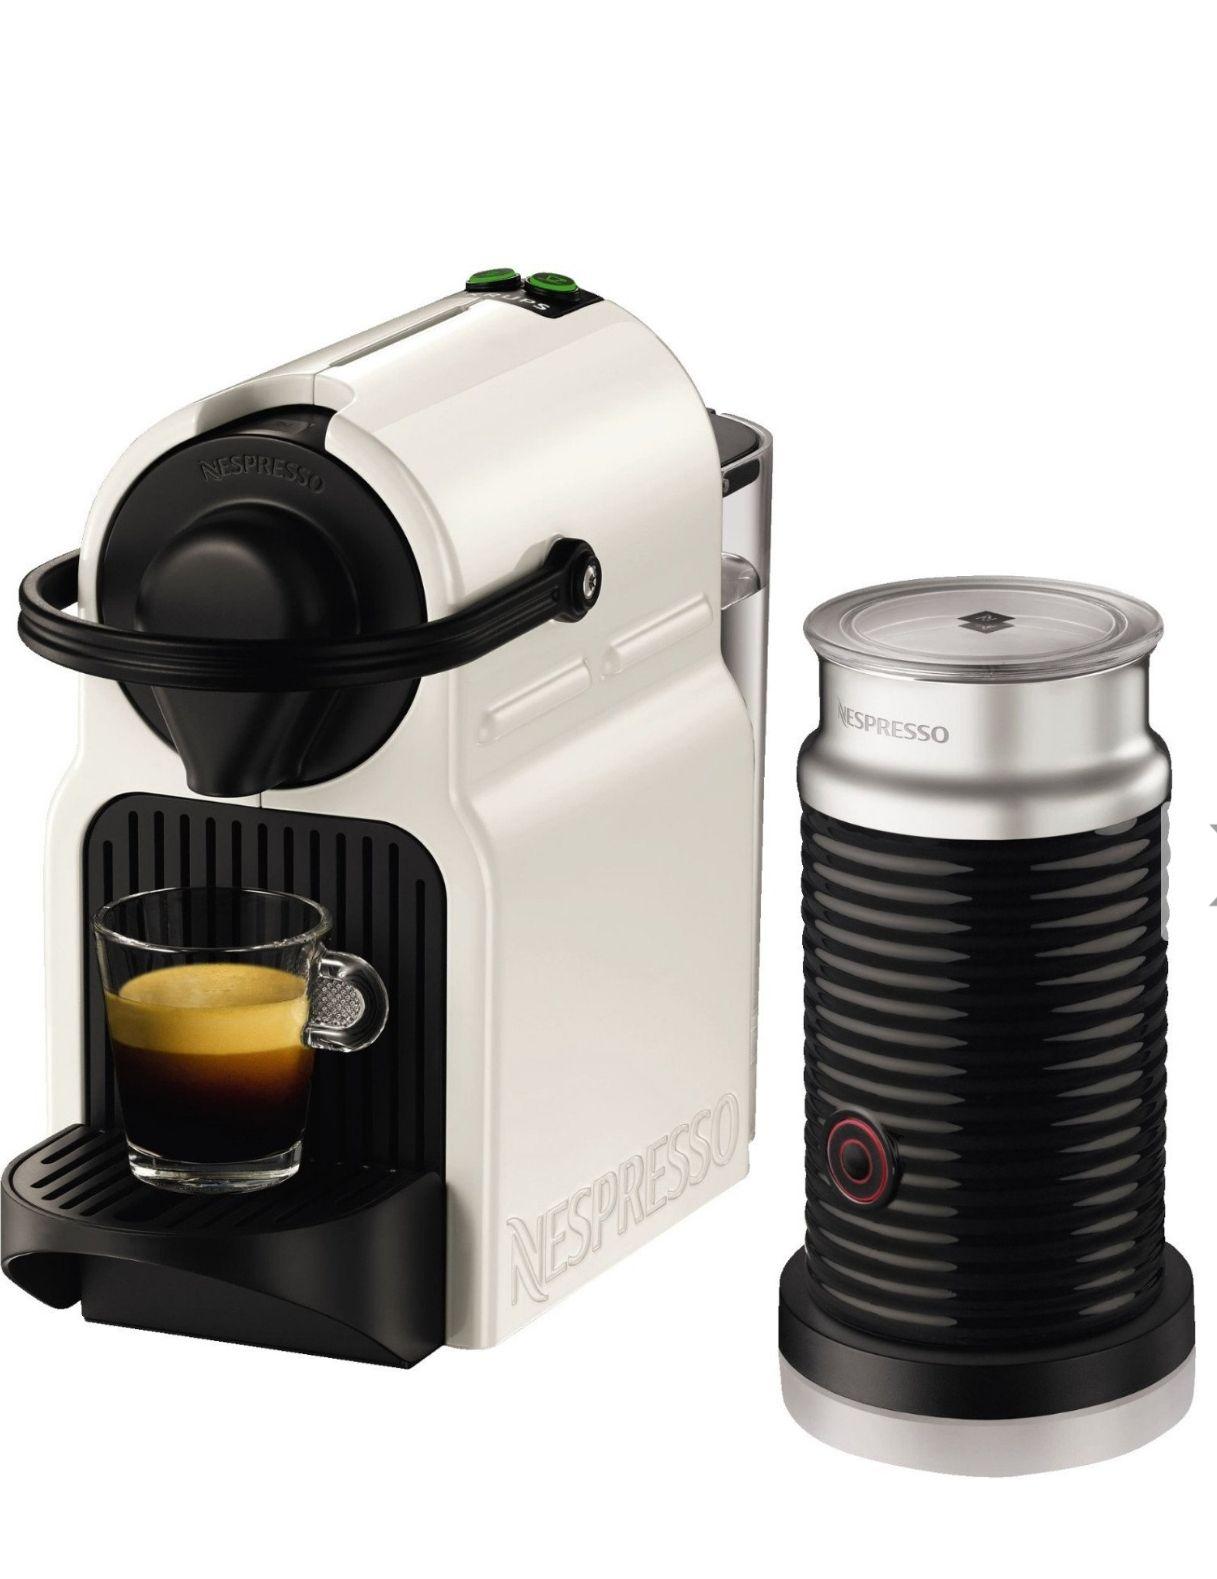 krups nespresso inissia bundle xn 1011 150 nespressokapseln gutschein f r 79 90 preisj ger at. Black Bedroom Furniture Sets. Home Design Ideas